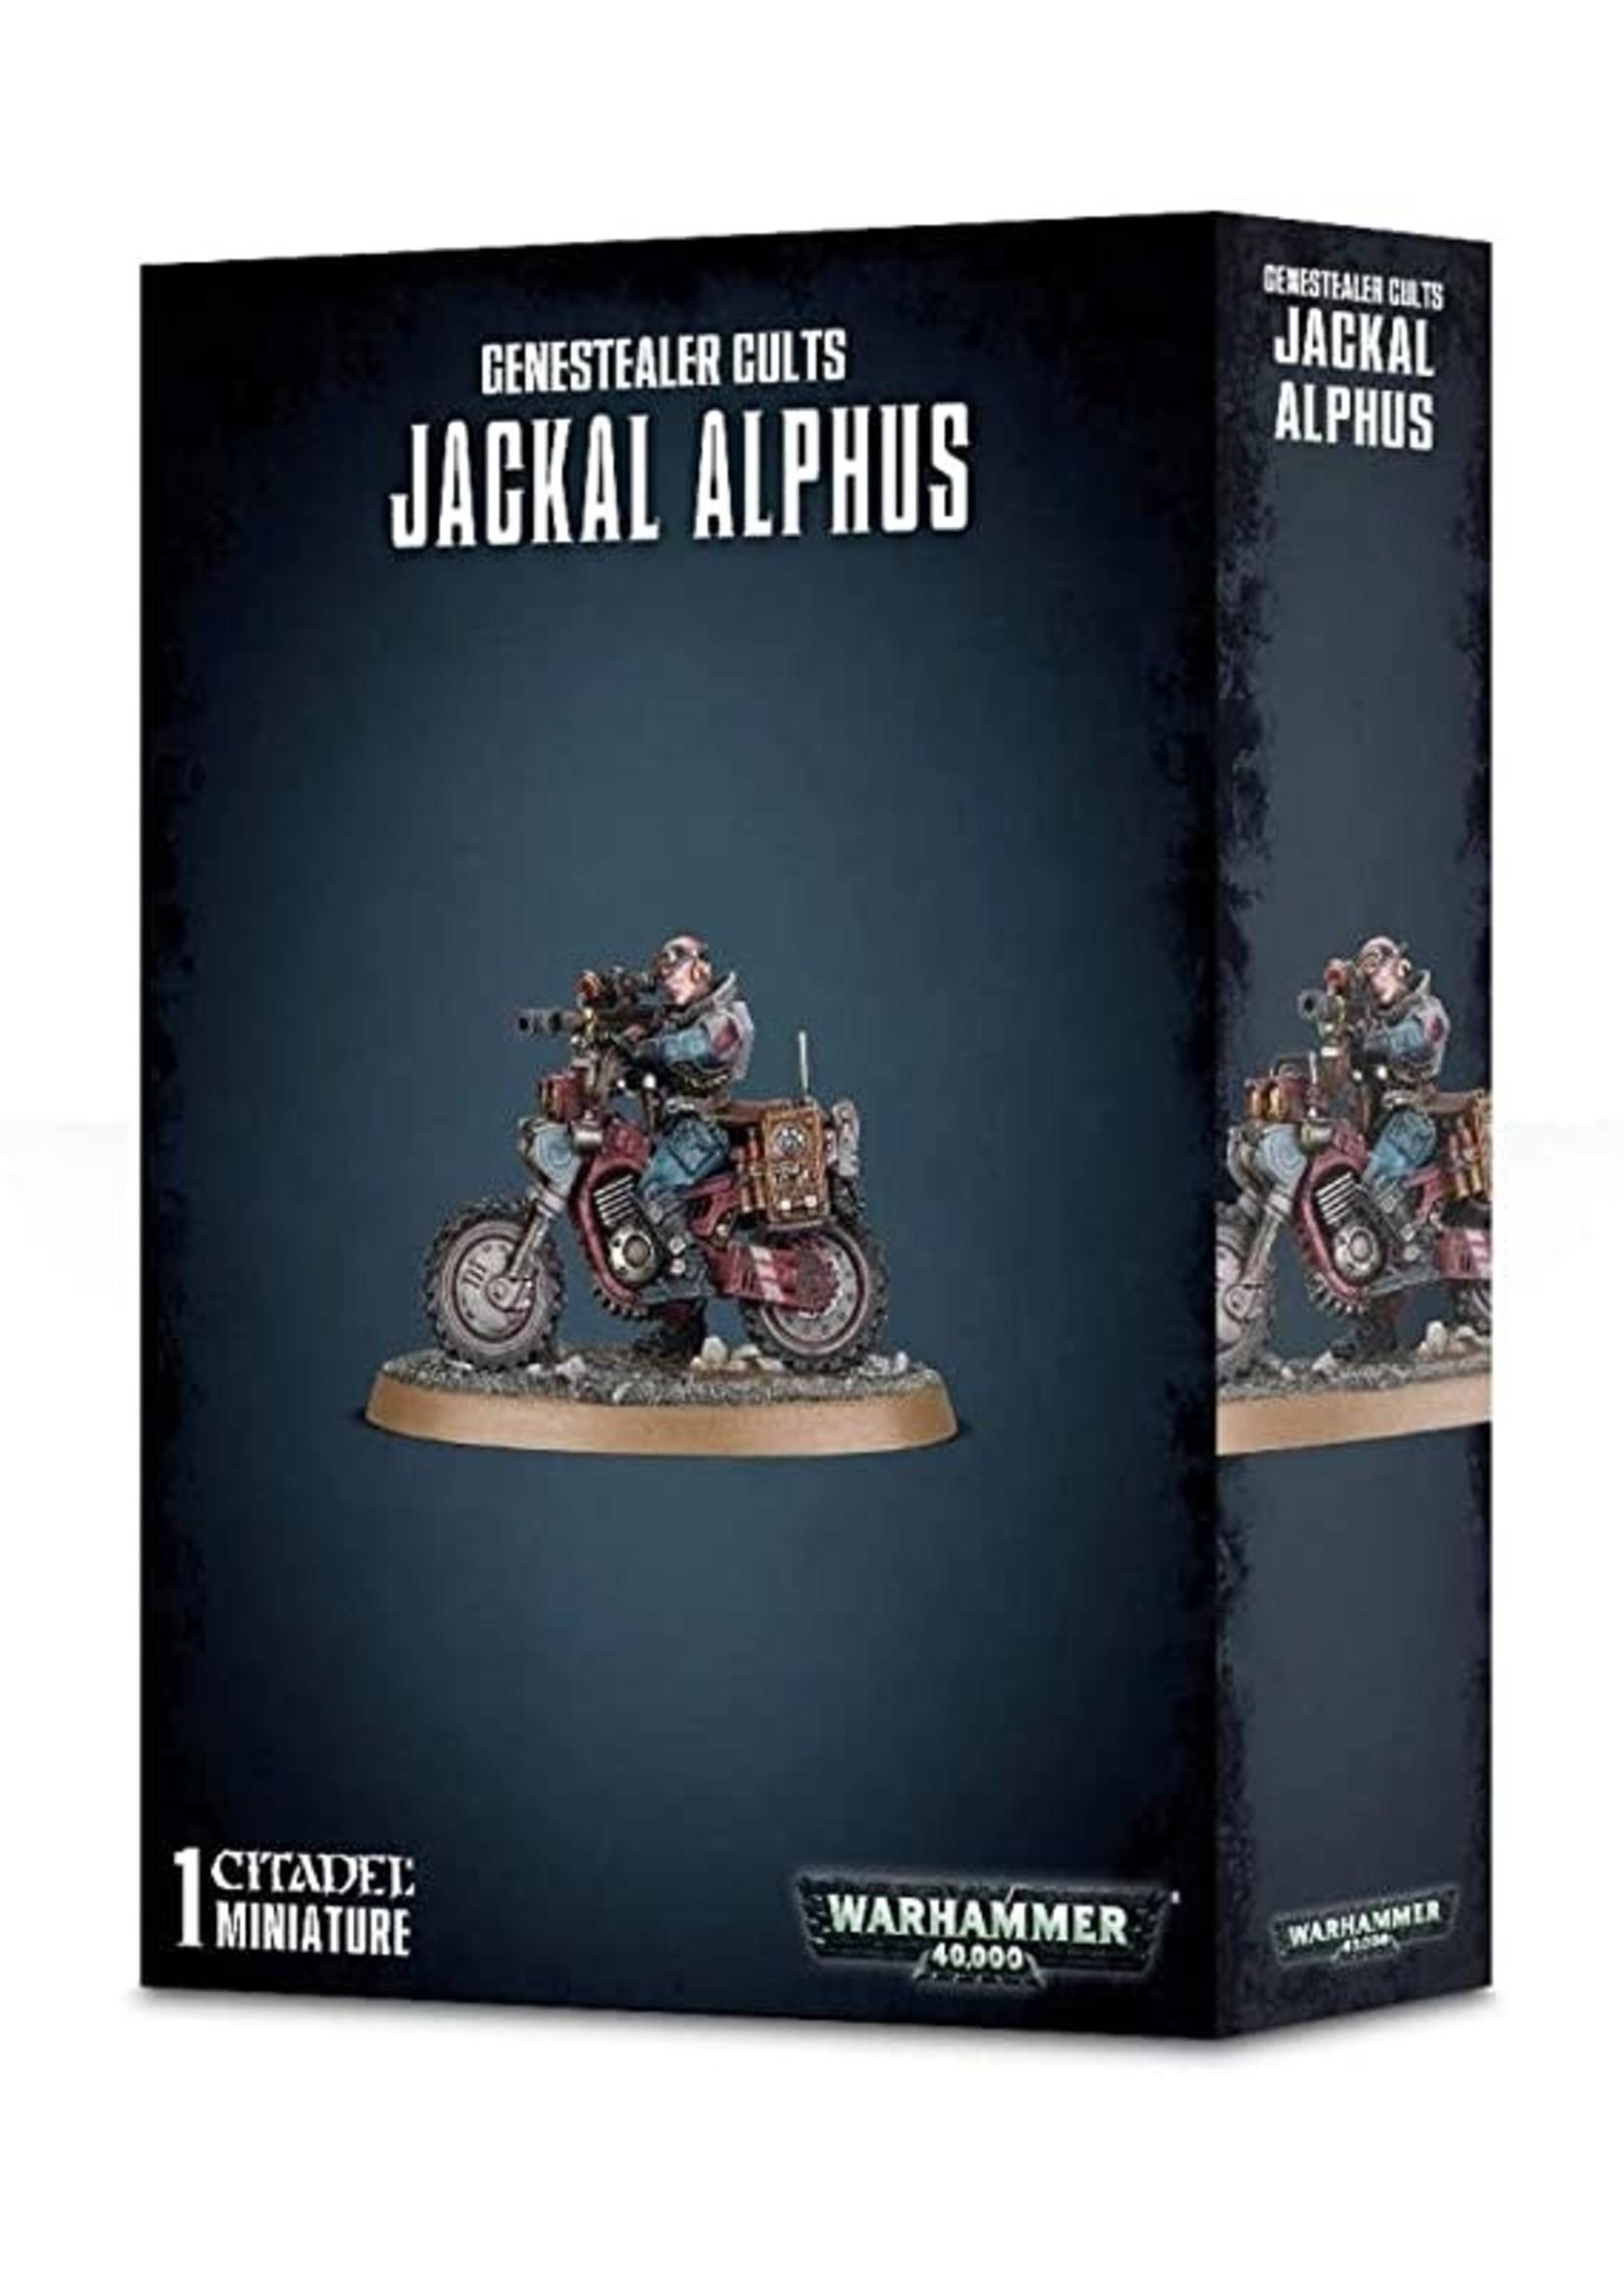 Genestealer Cults Jackal Alphus (40K)